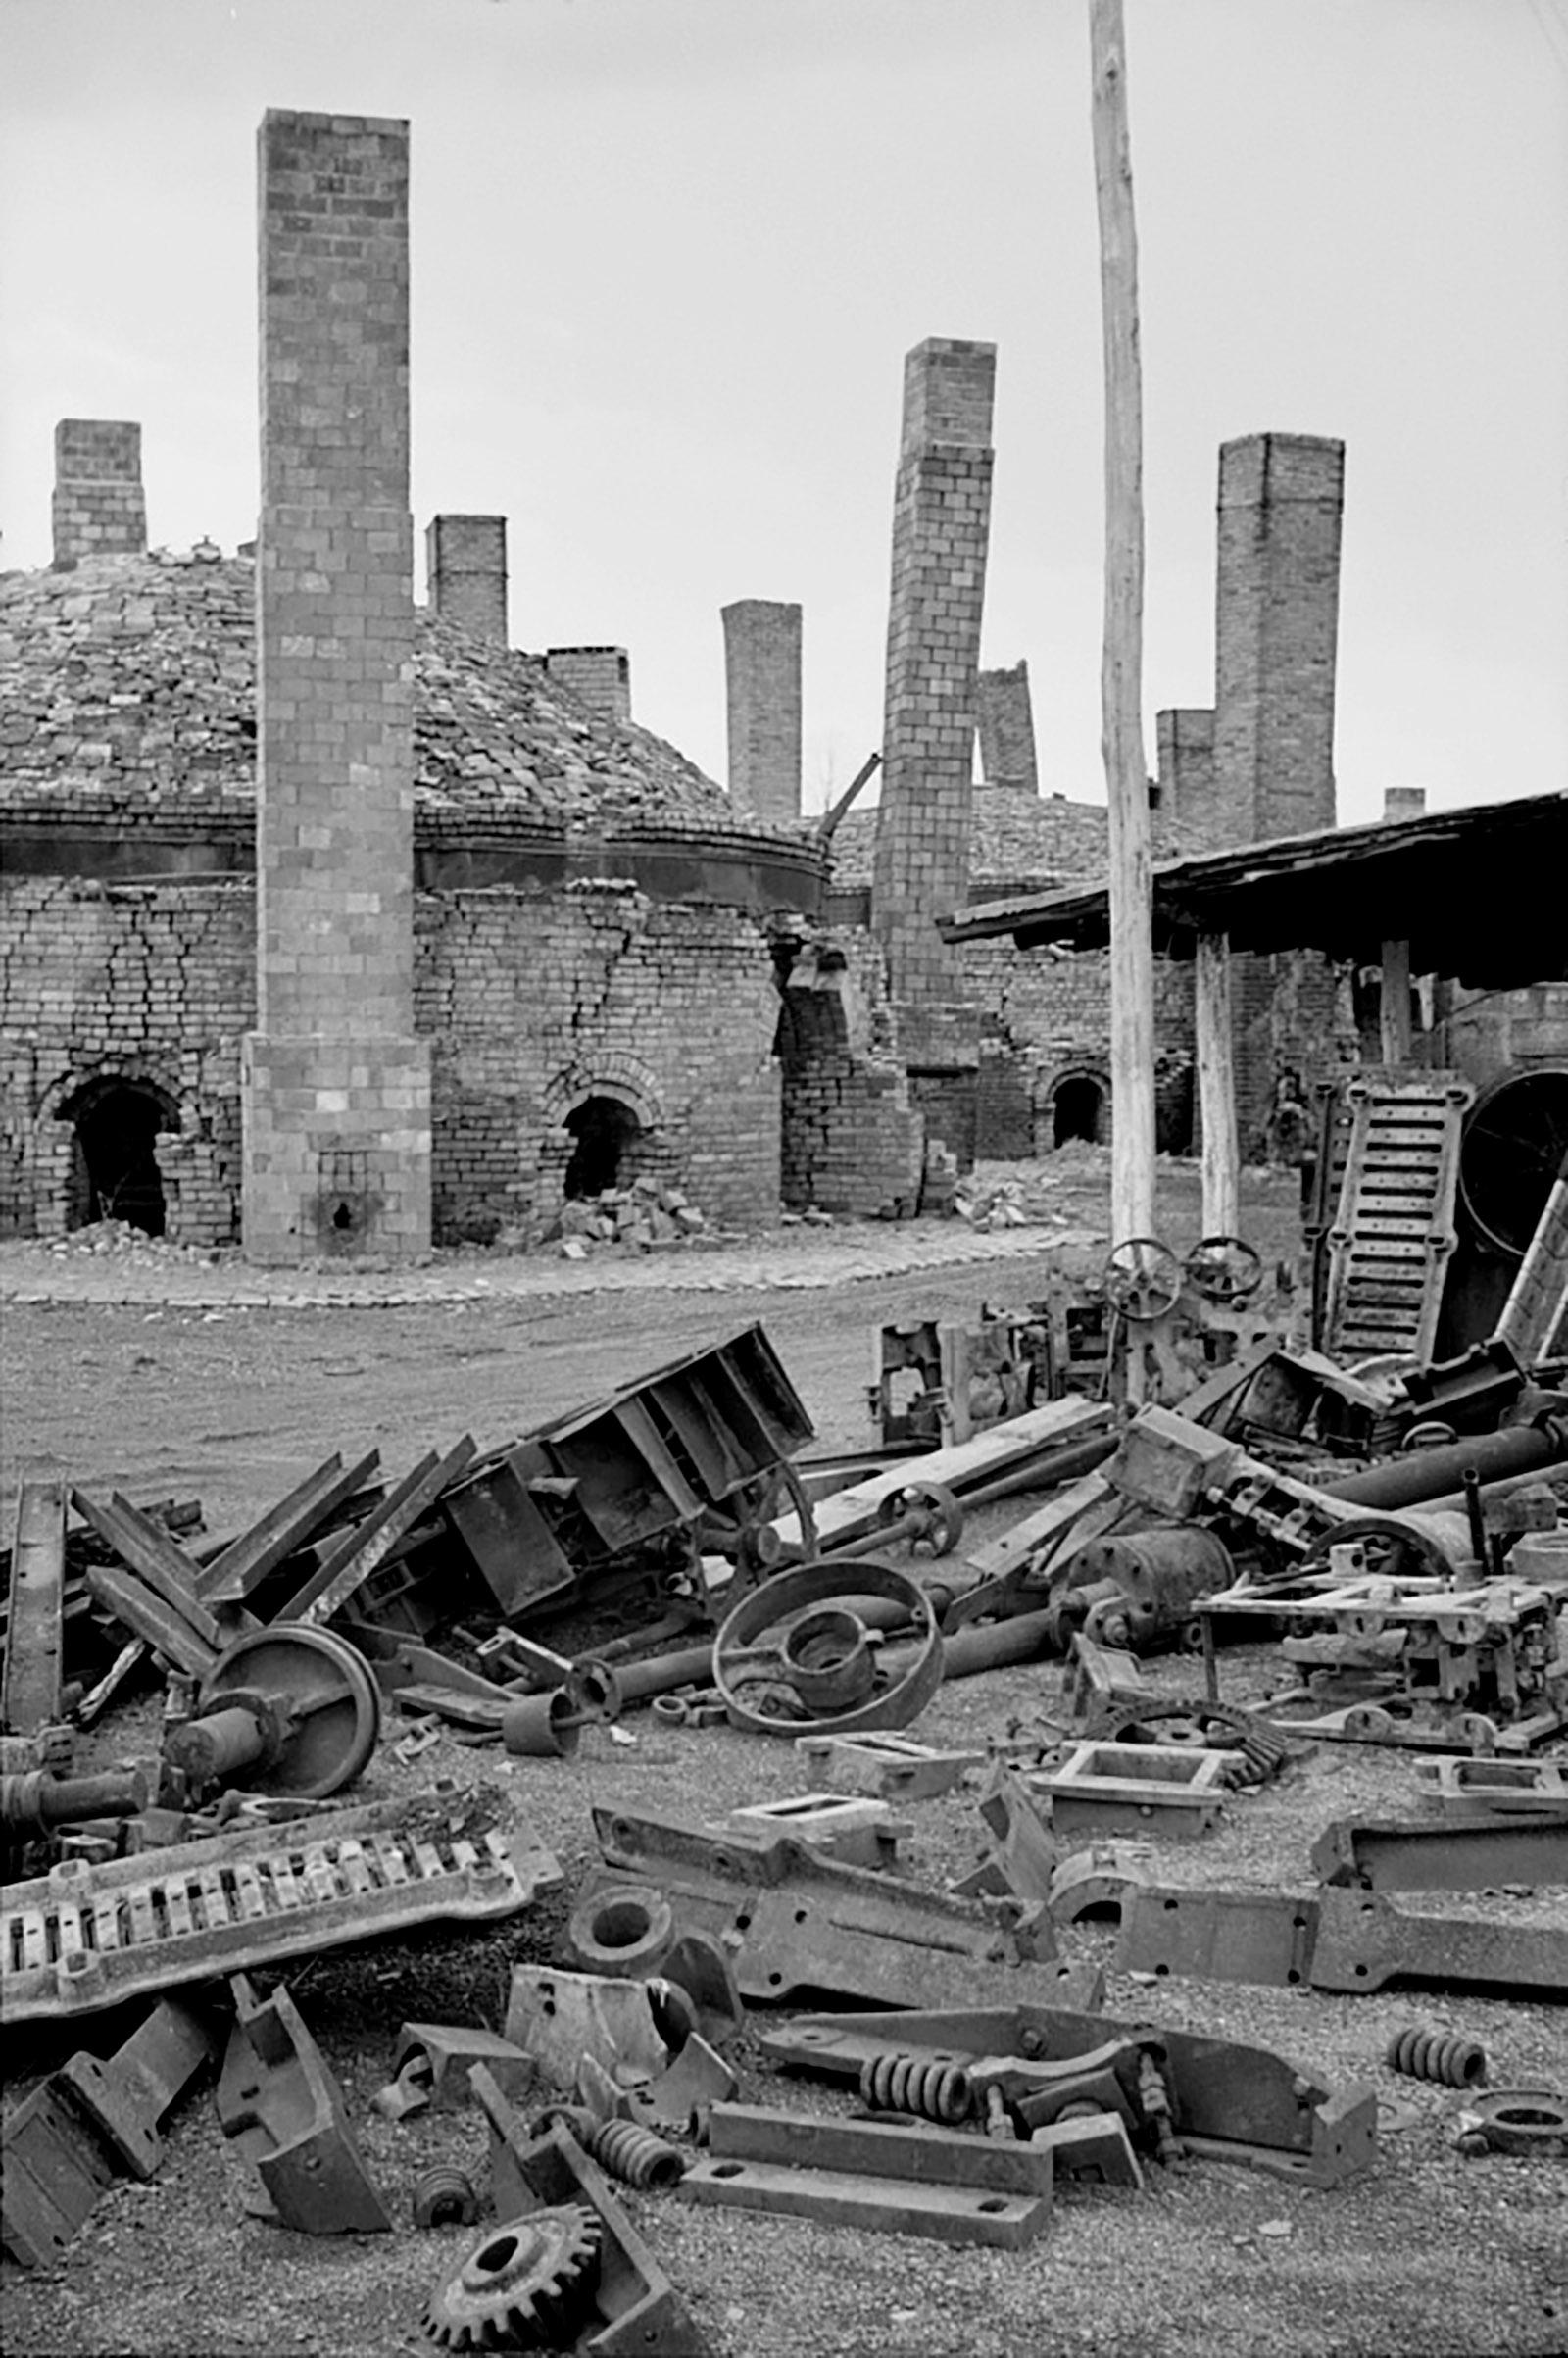 An abandoned brick factory, Ohio, 1936